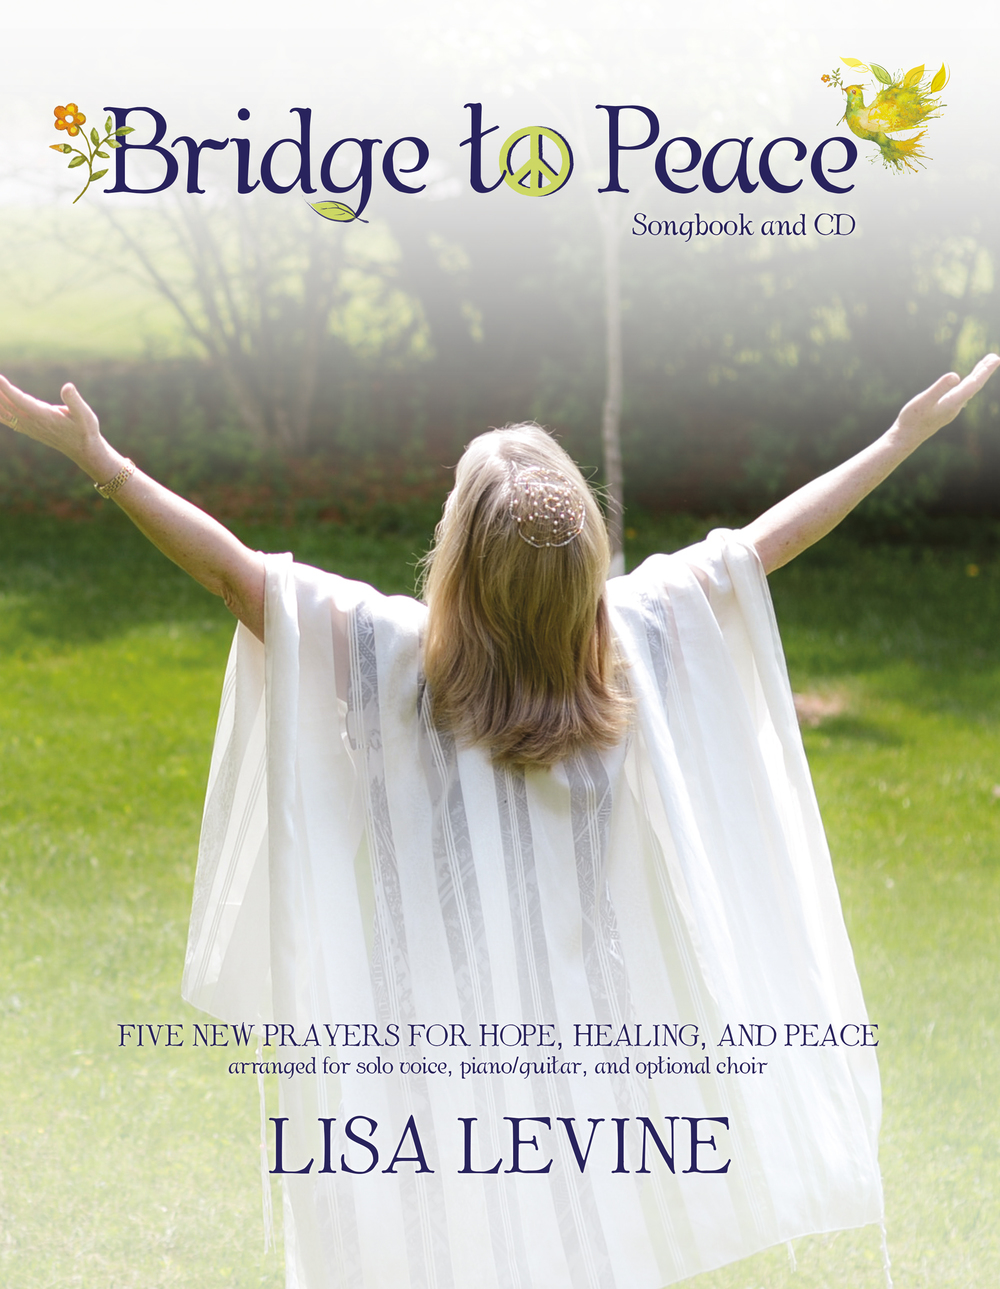 14Bridge-To-Peace-Songbook-Cover.jpg